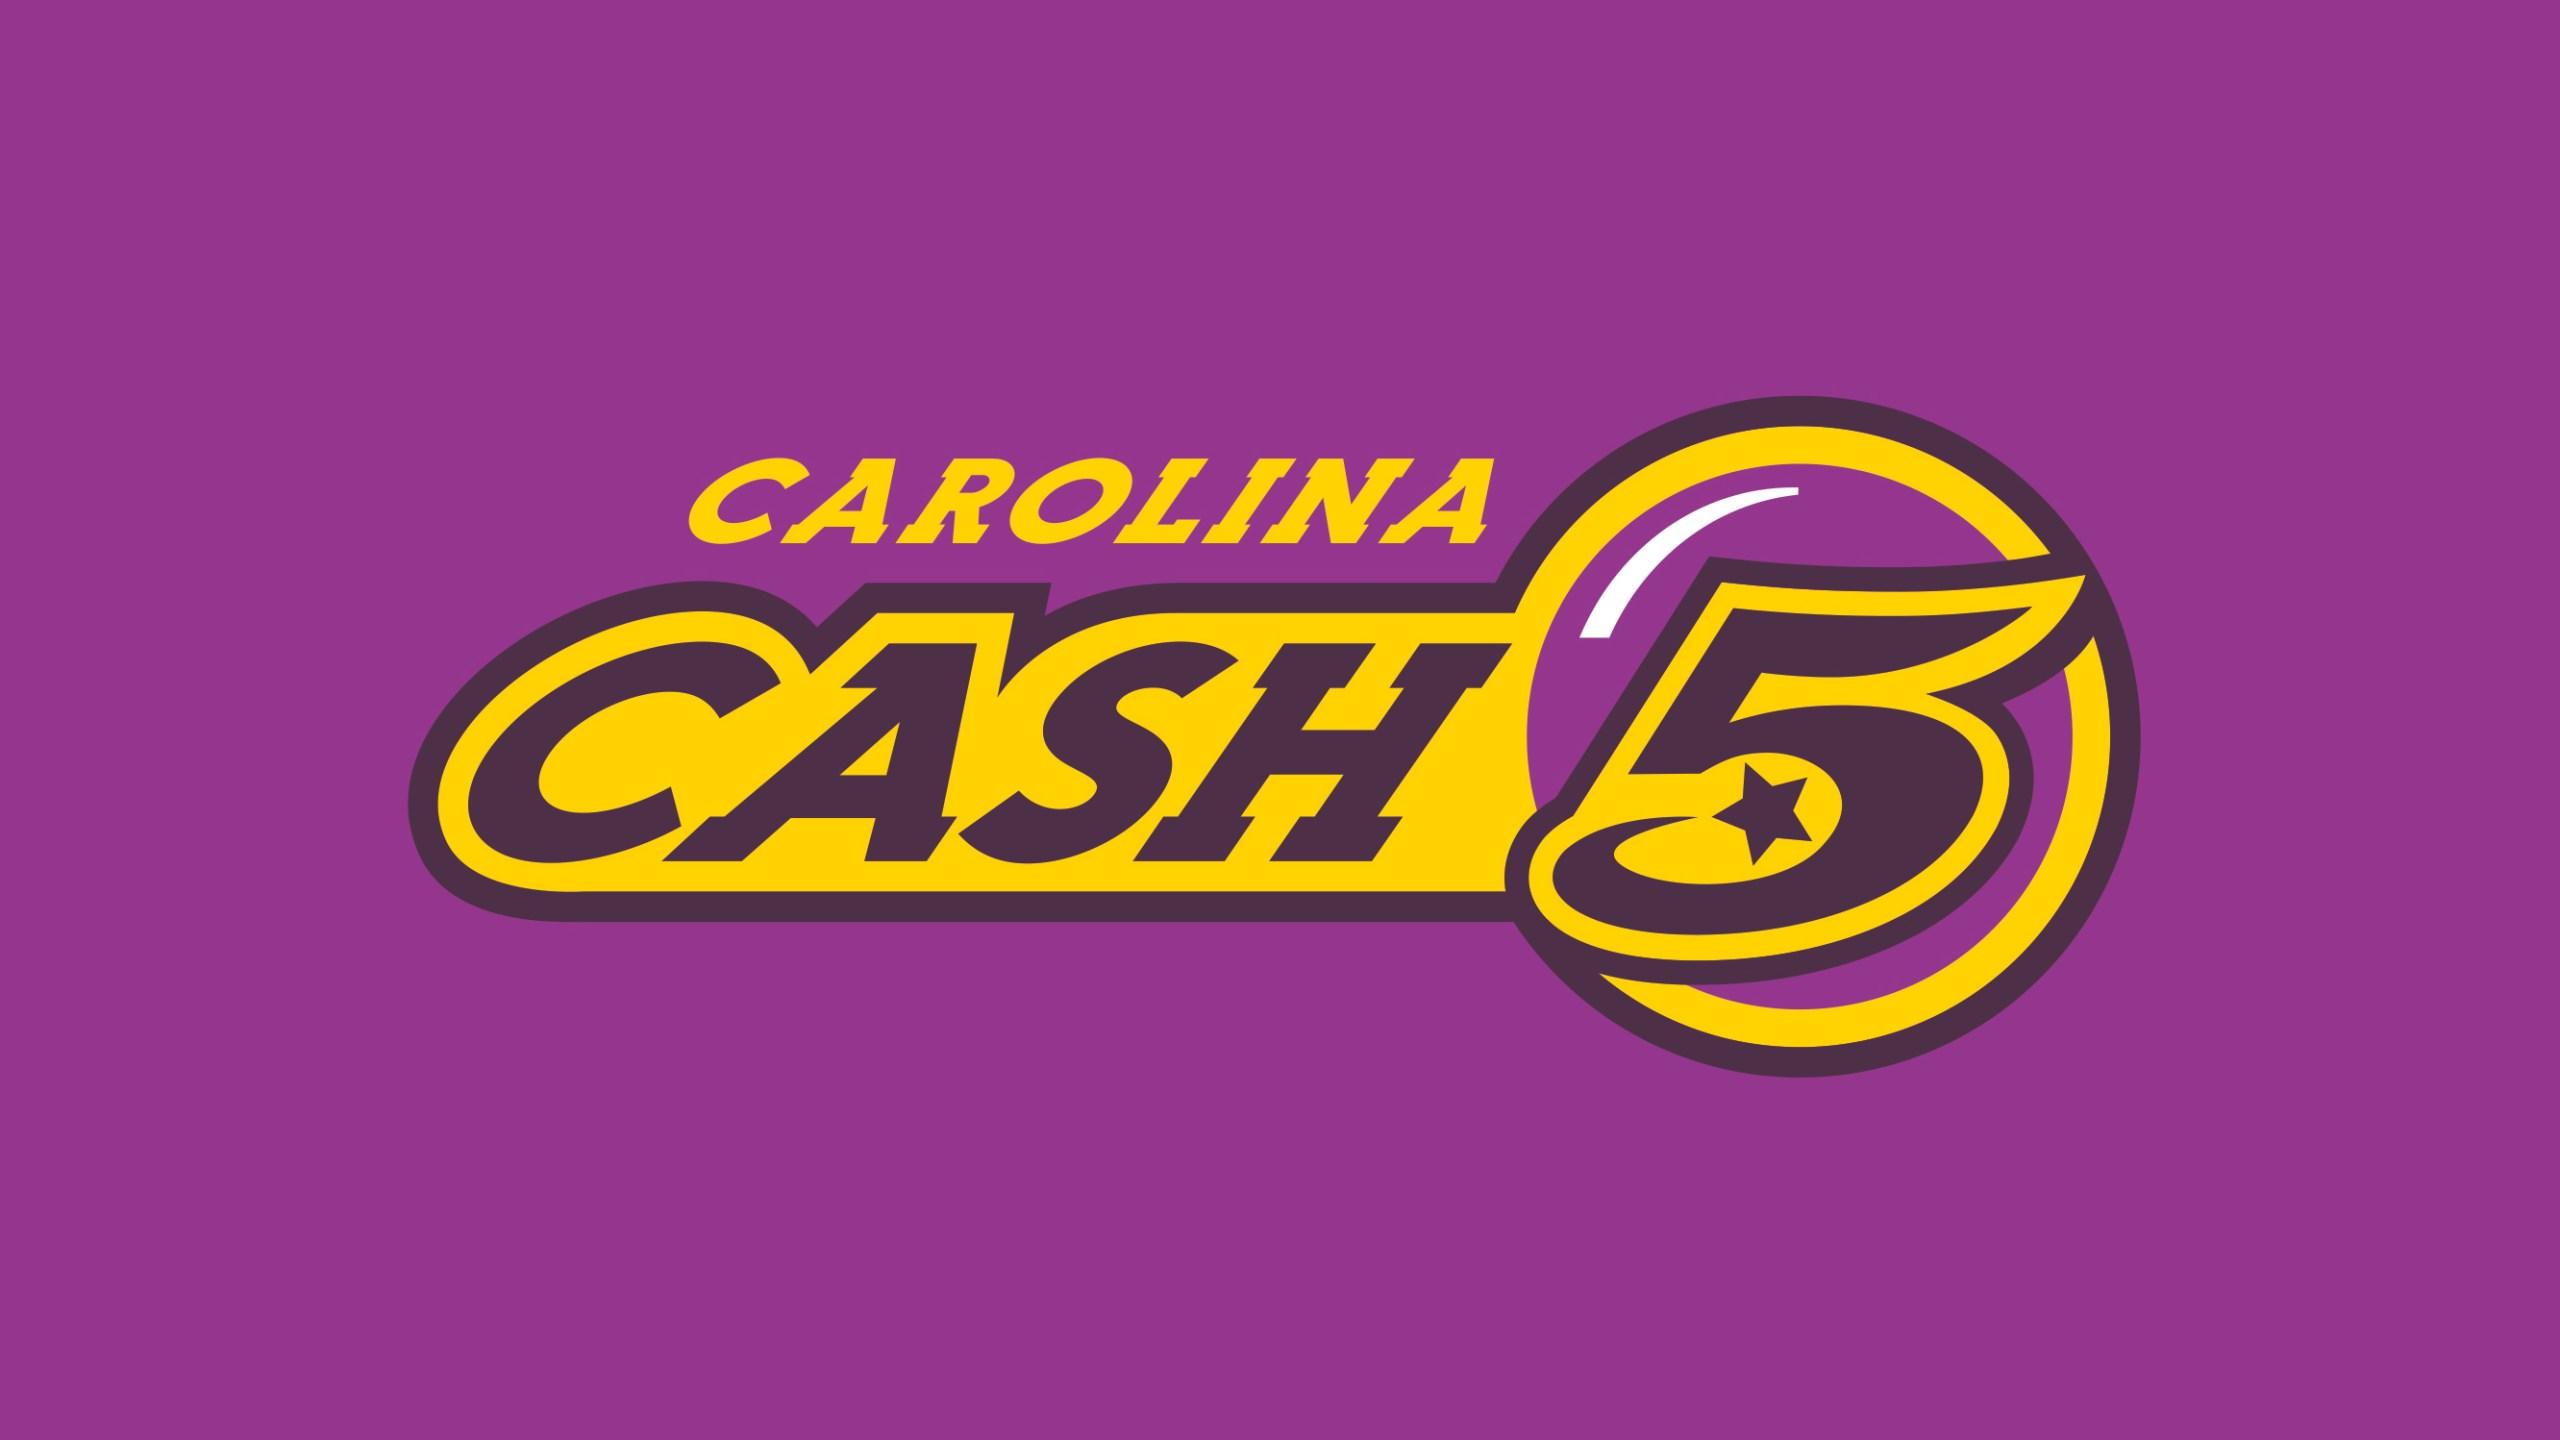 NC Education Lottery Cash 5 Logo on Plum_640x480_1552335040451.jpg.jpg